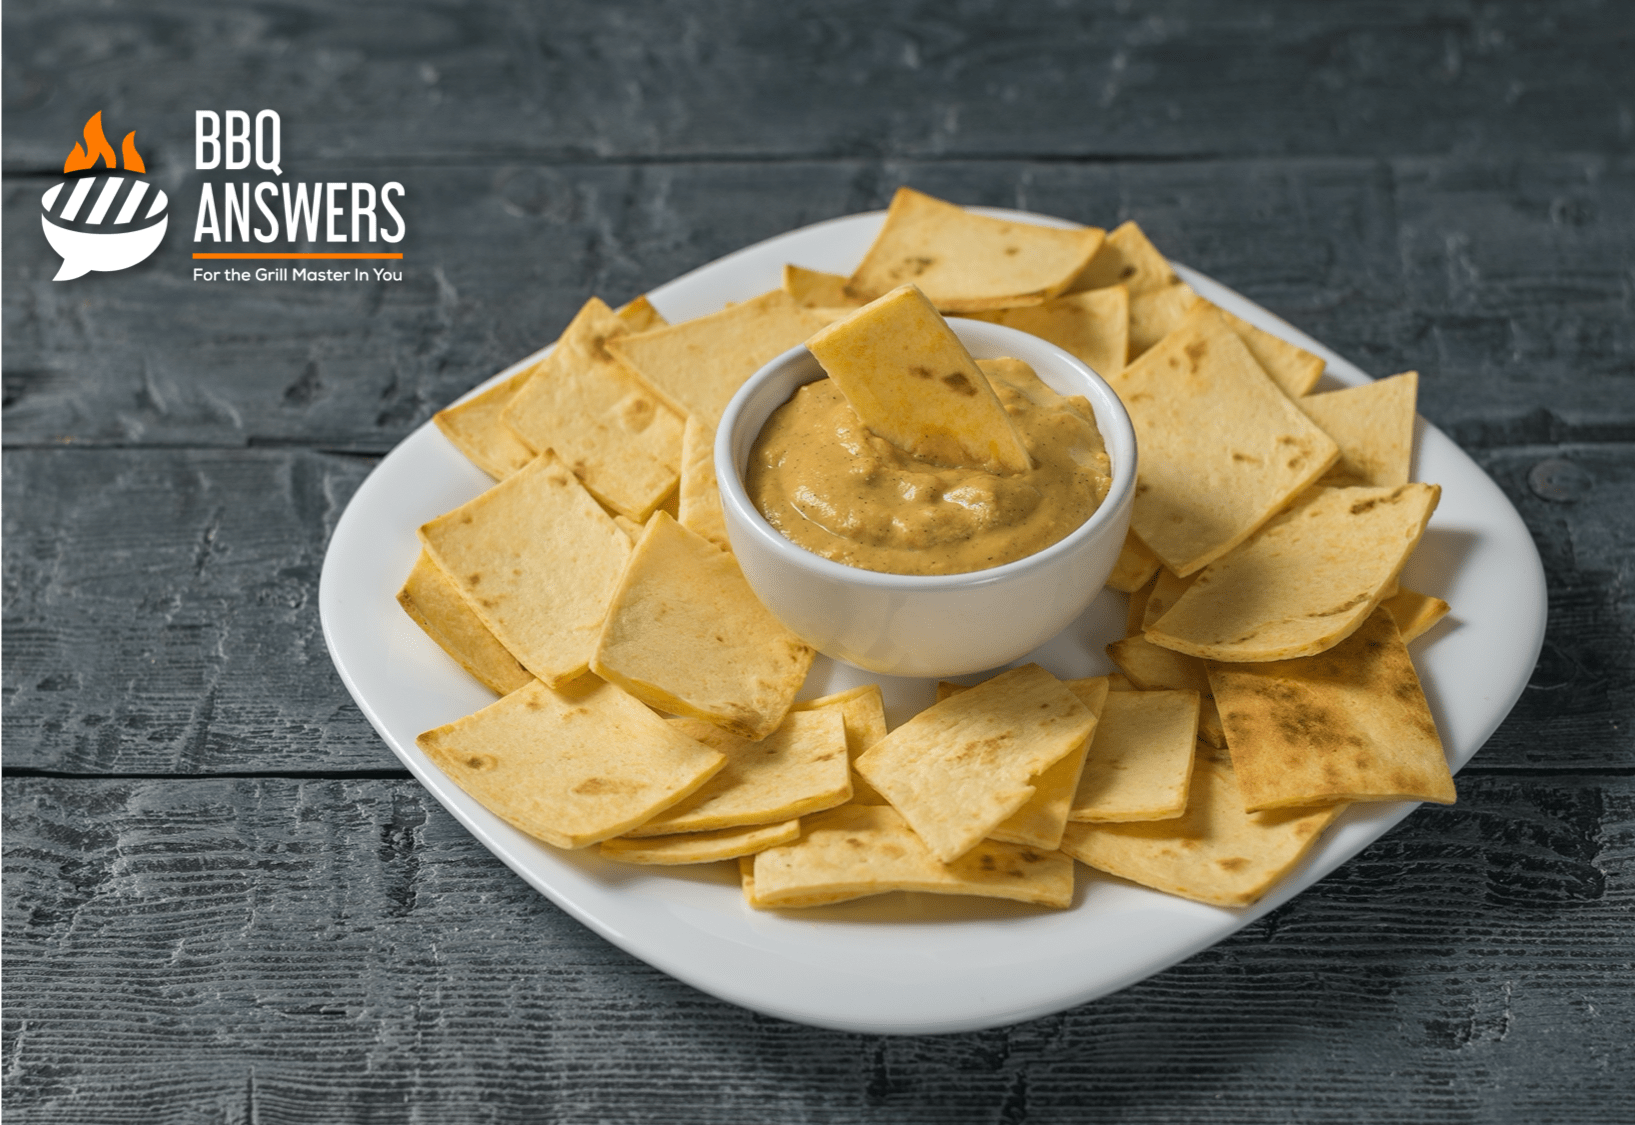 Vegan BBQ Fritos | Vegan BBQ Sides | BBQanswers